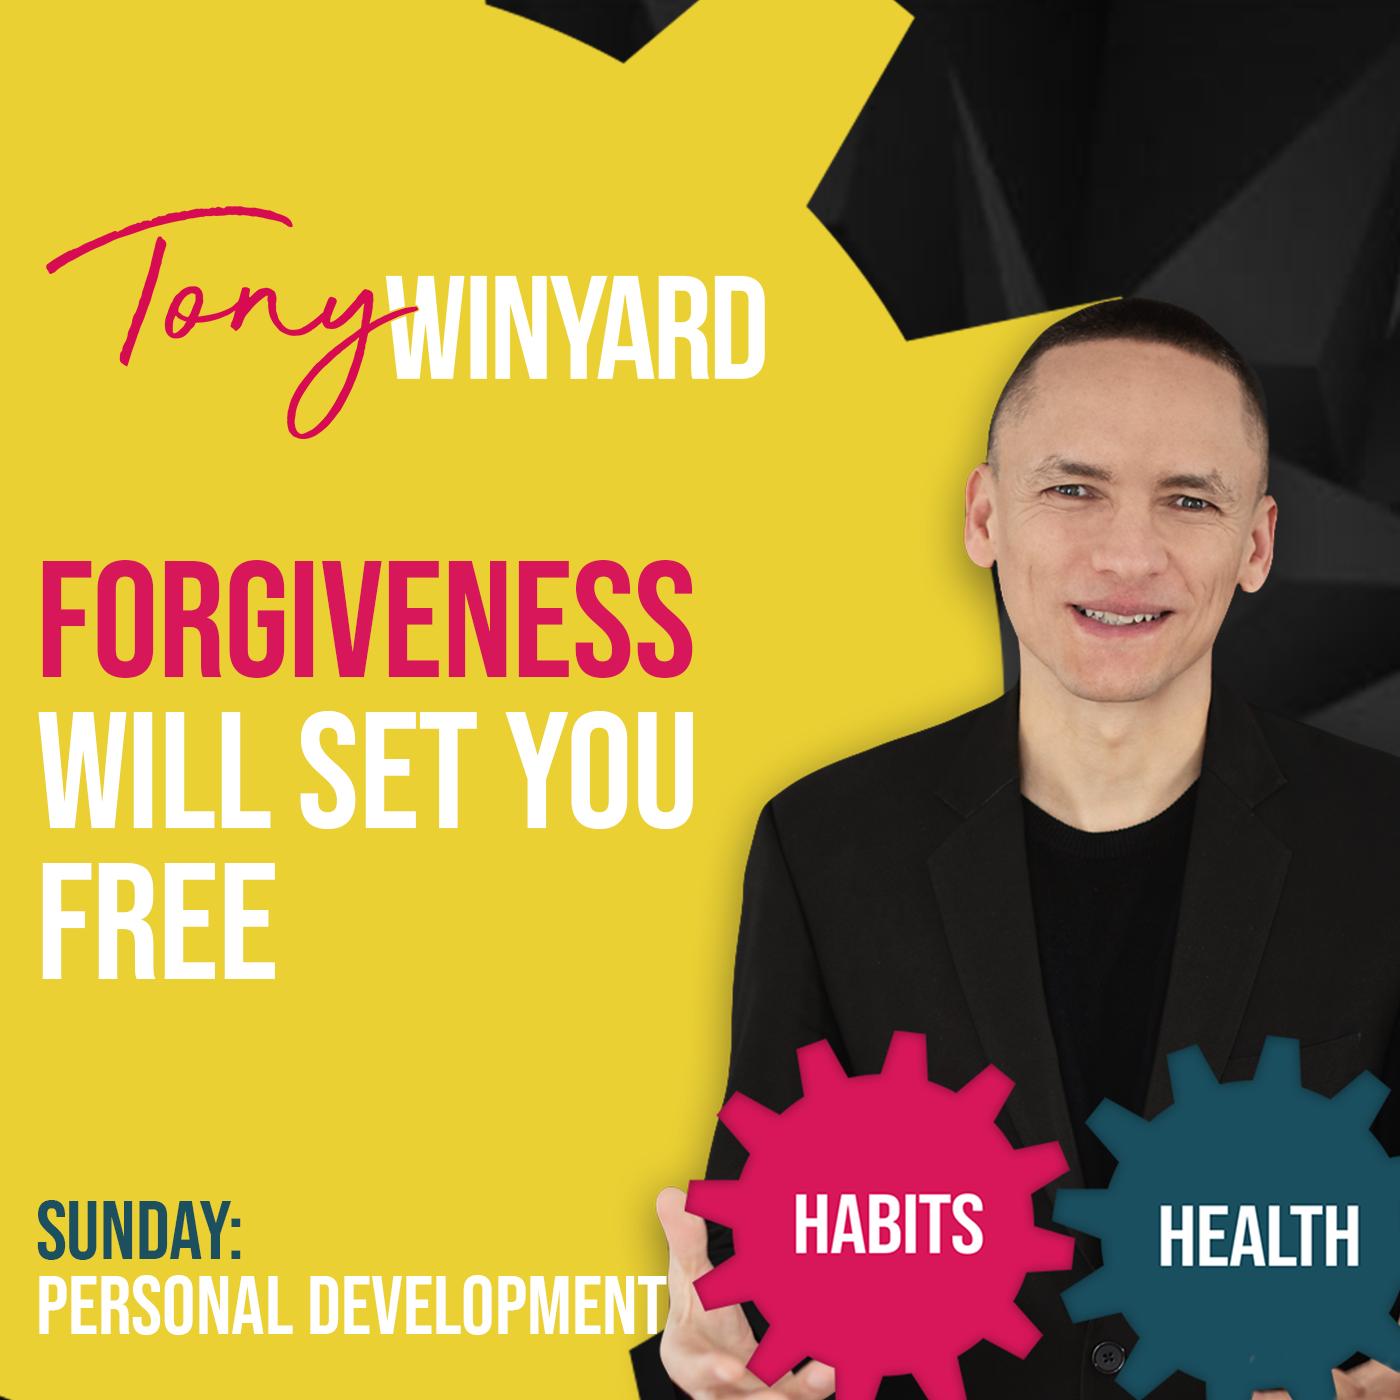 Forgiveness will set you free